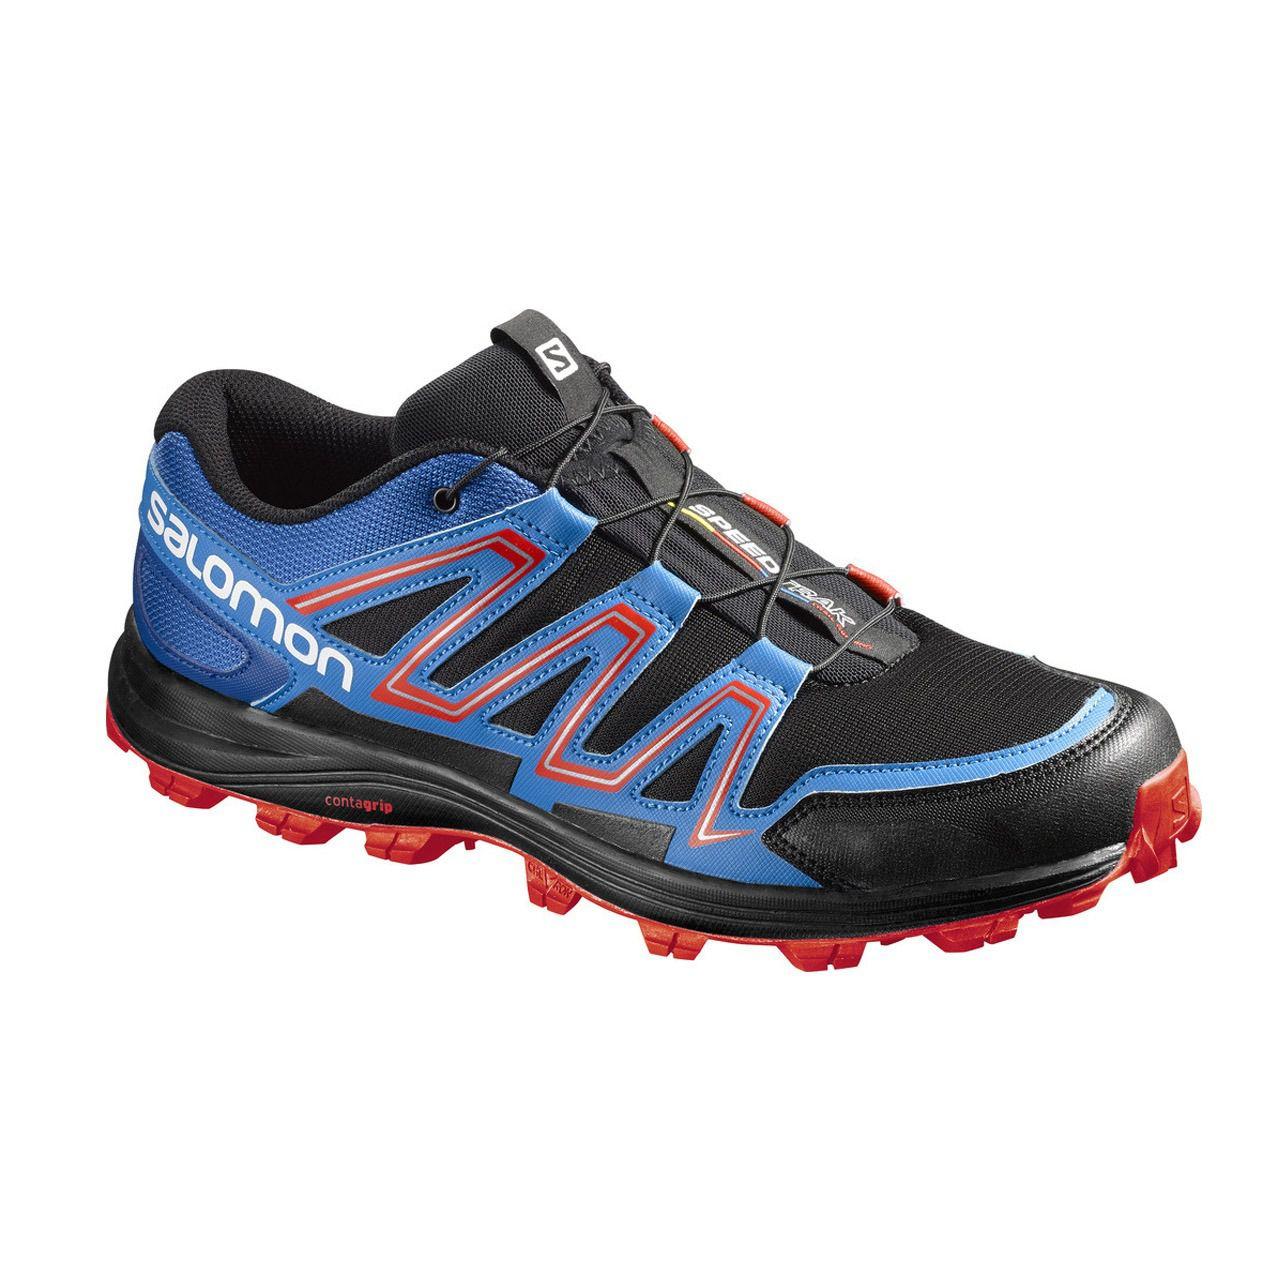 Tênis Salomon Speedtrak Masc - Azul/vermelho